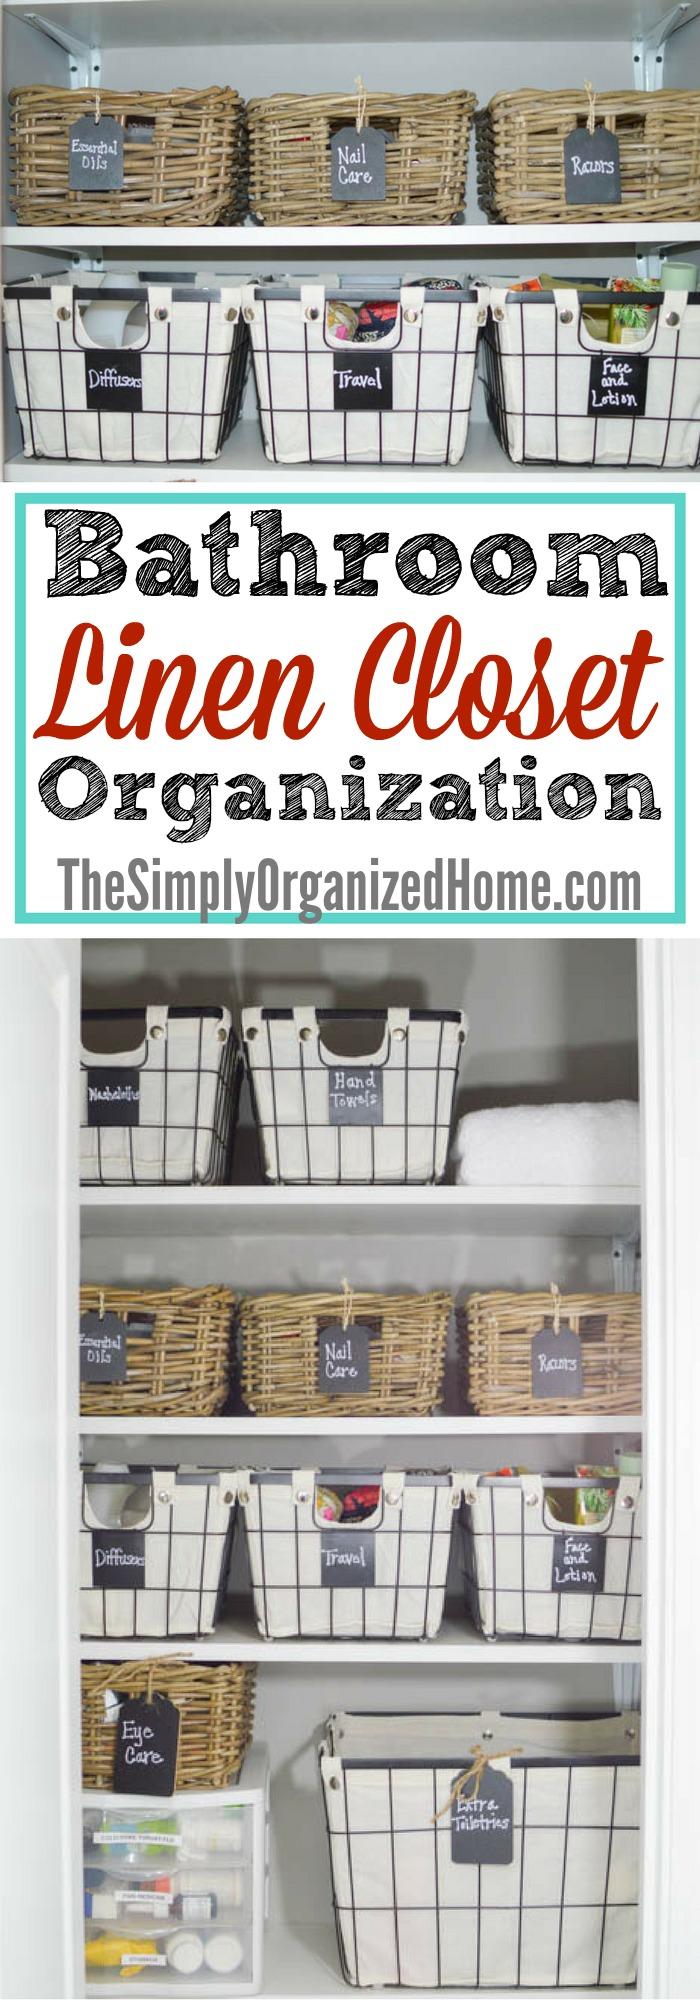 Bathroom Linen Closet Organization The Simply Organized Home